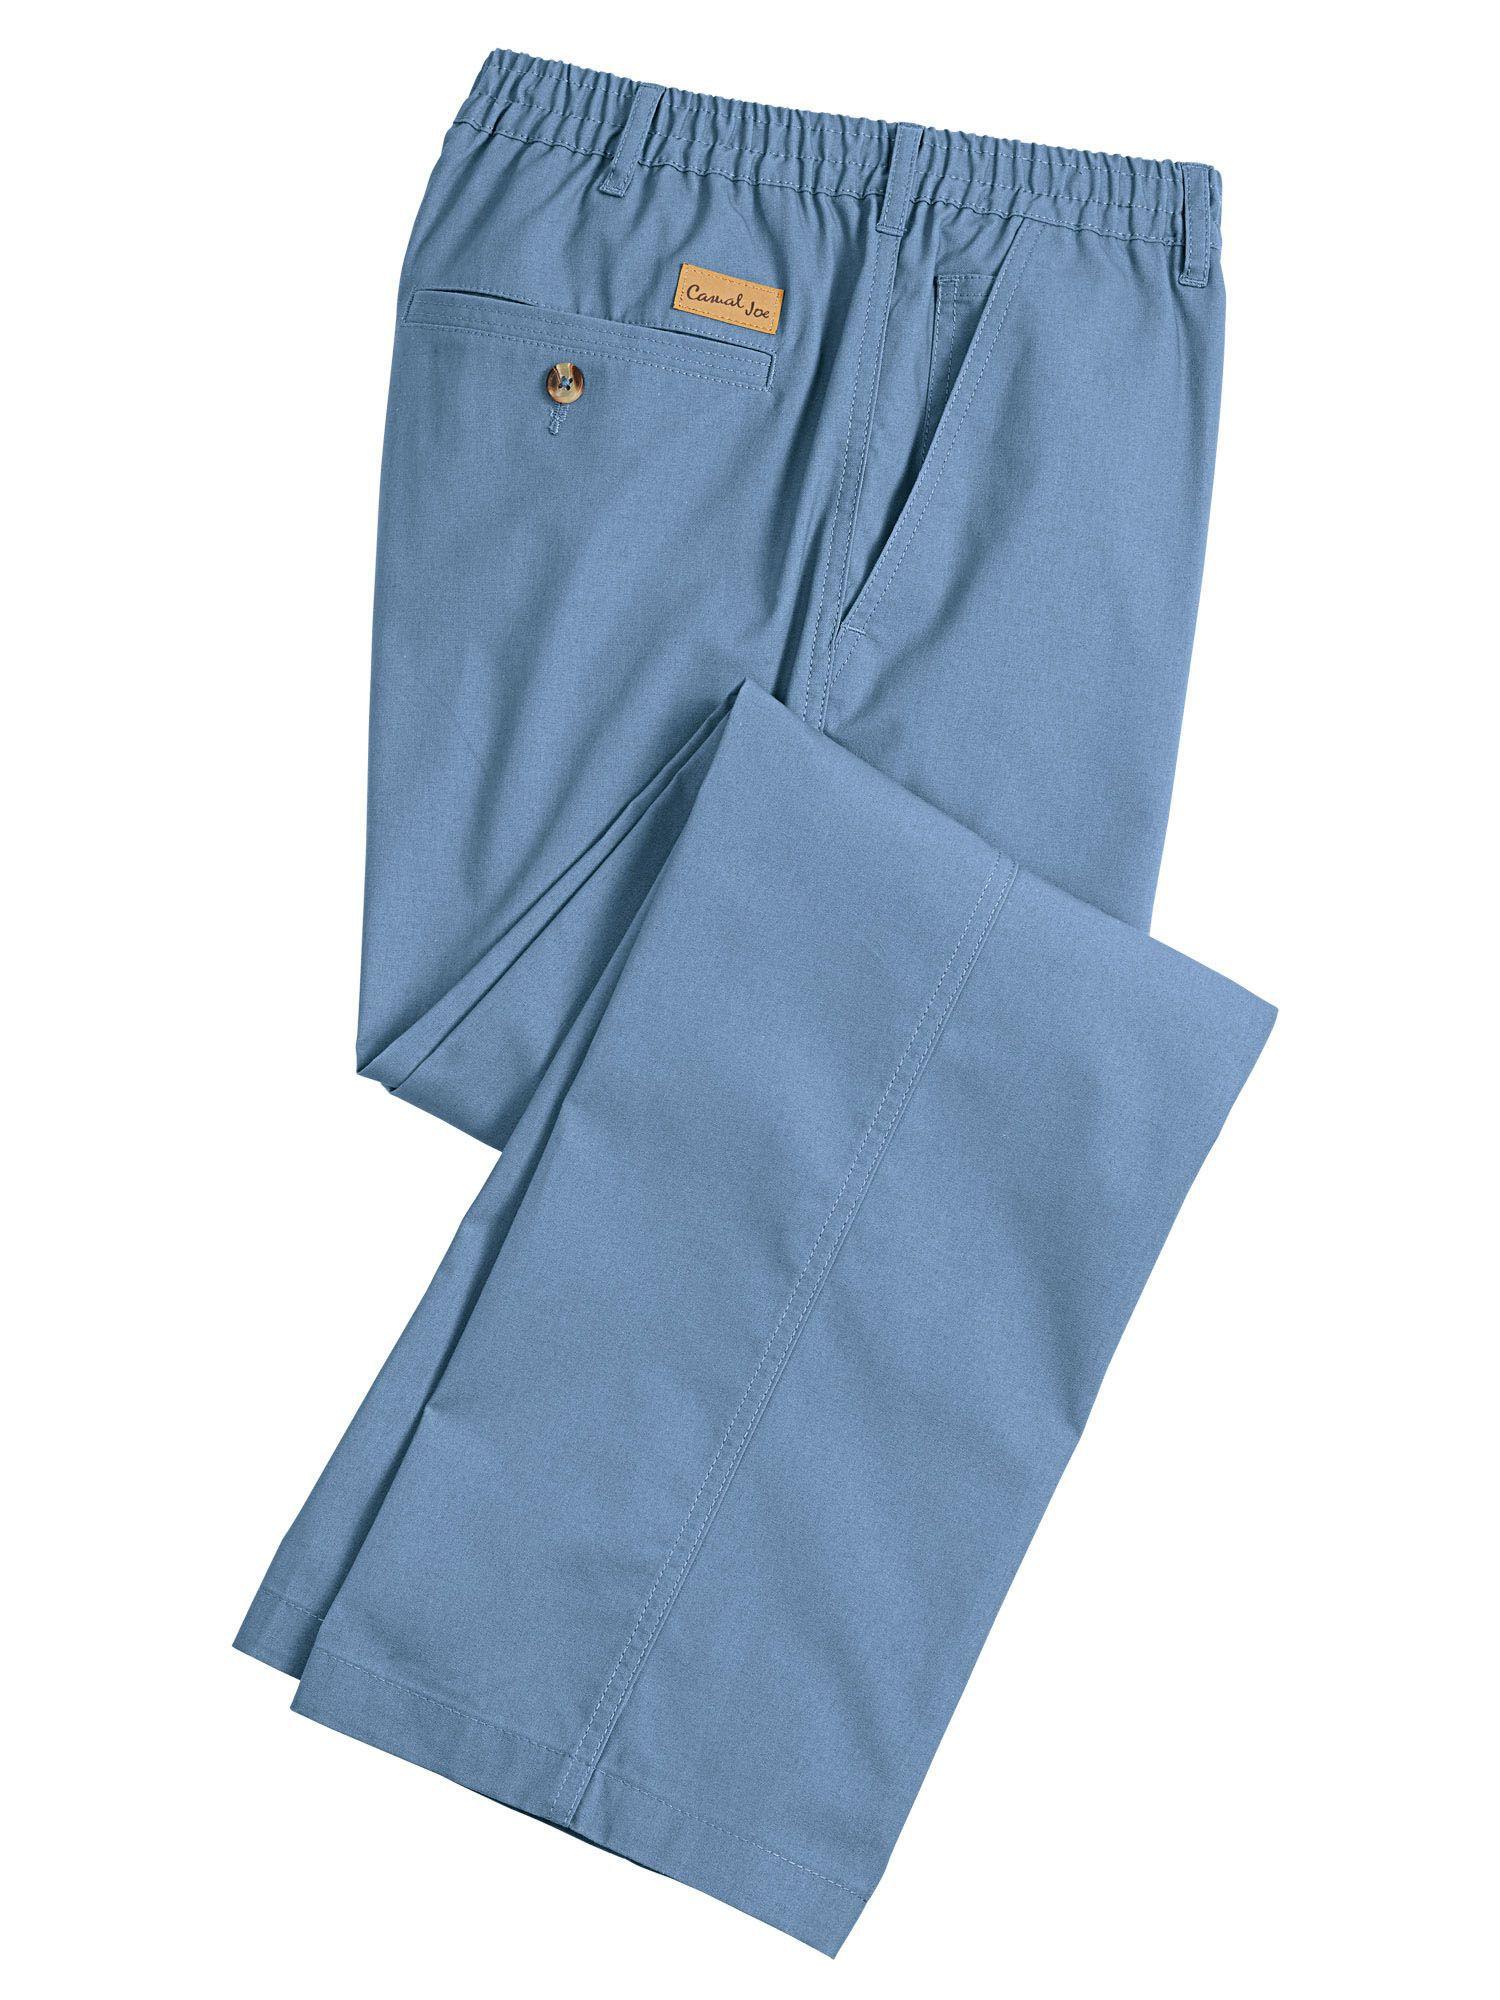 Casual Joe® Stretch Waist, Wrinkle Resistant Poplin Pants